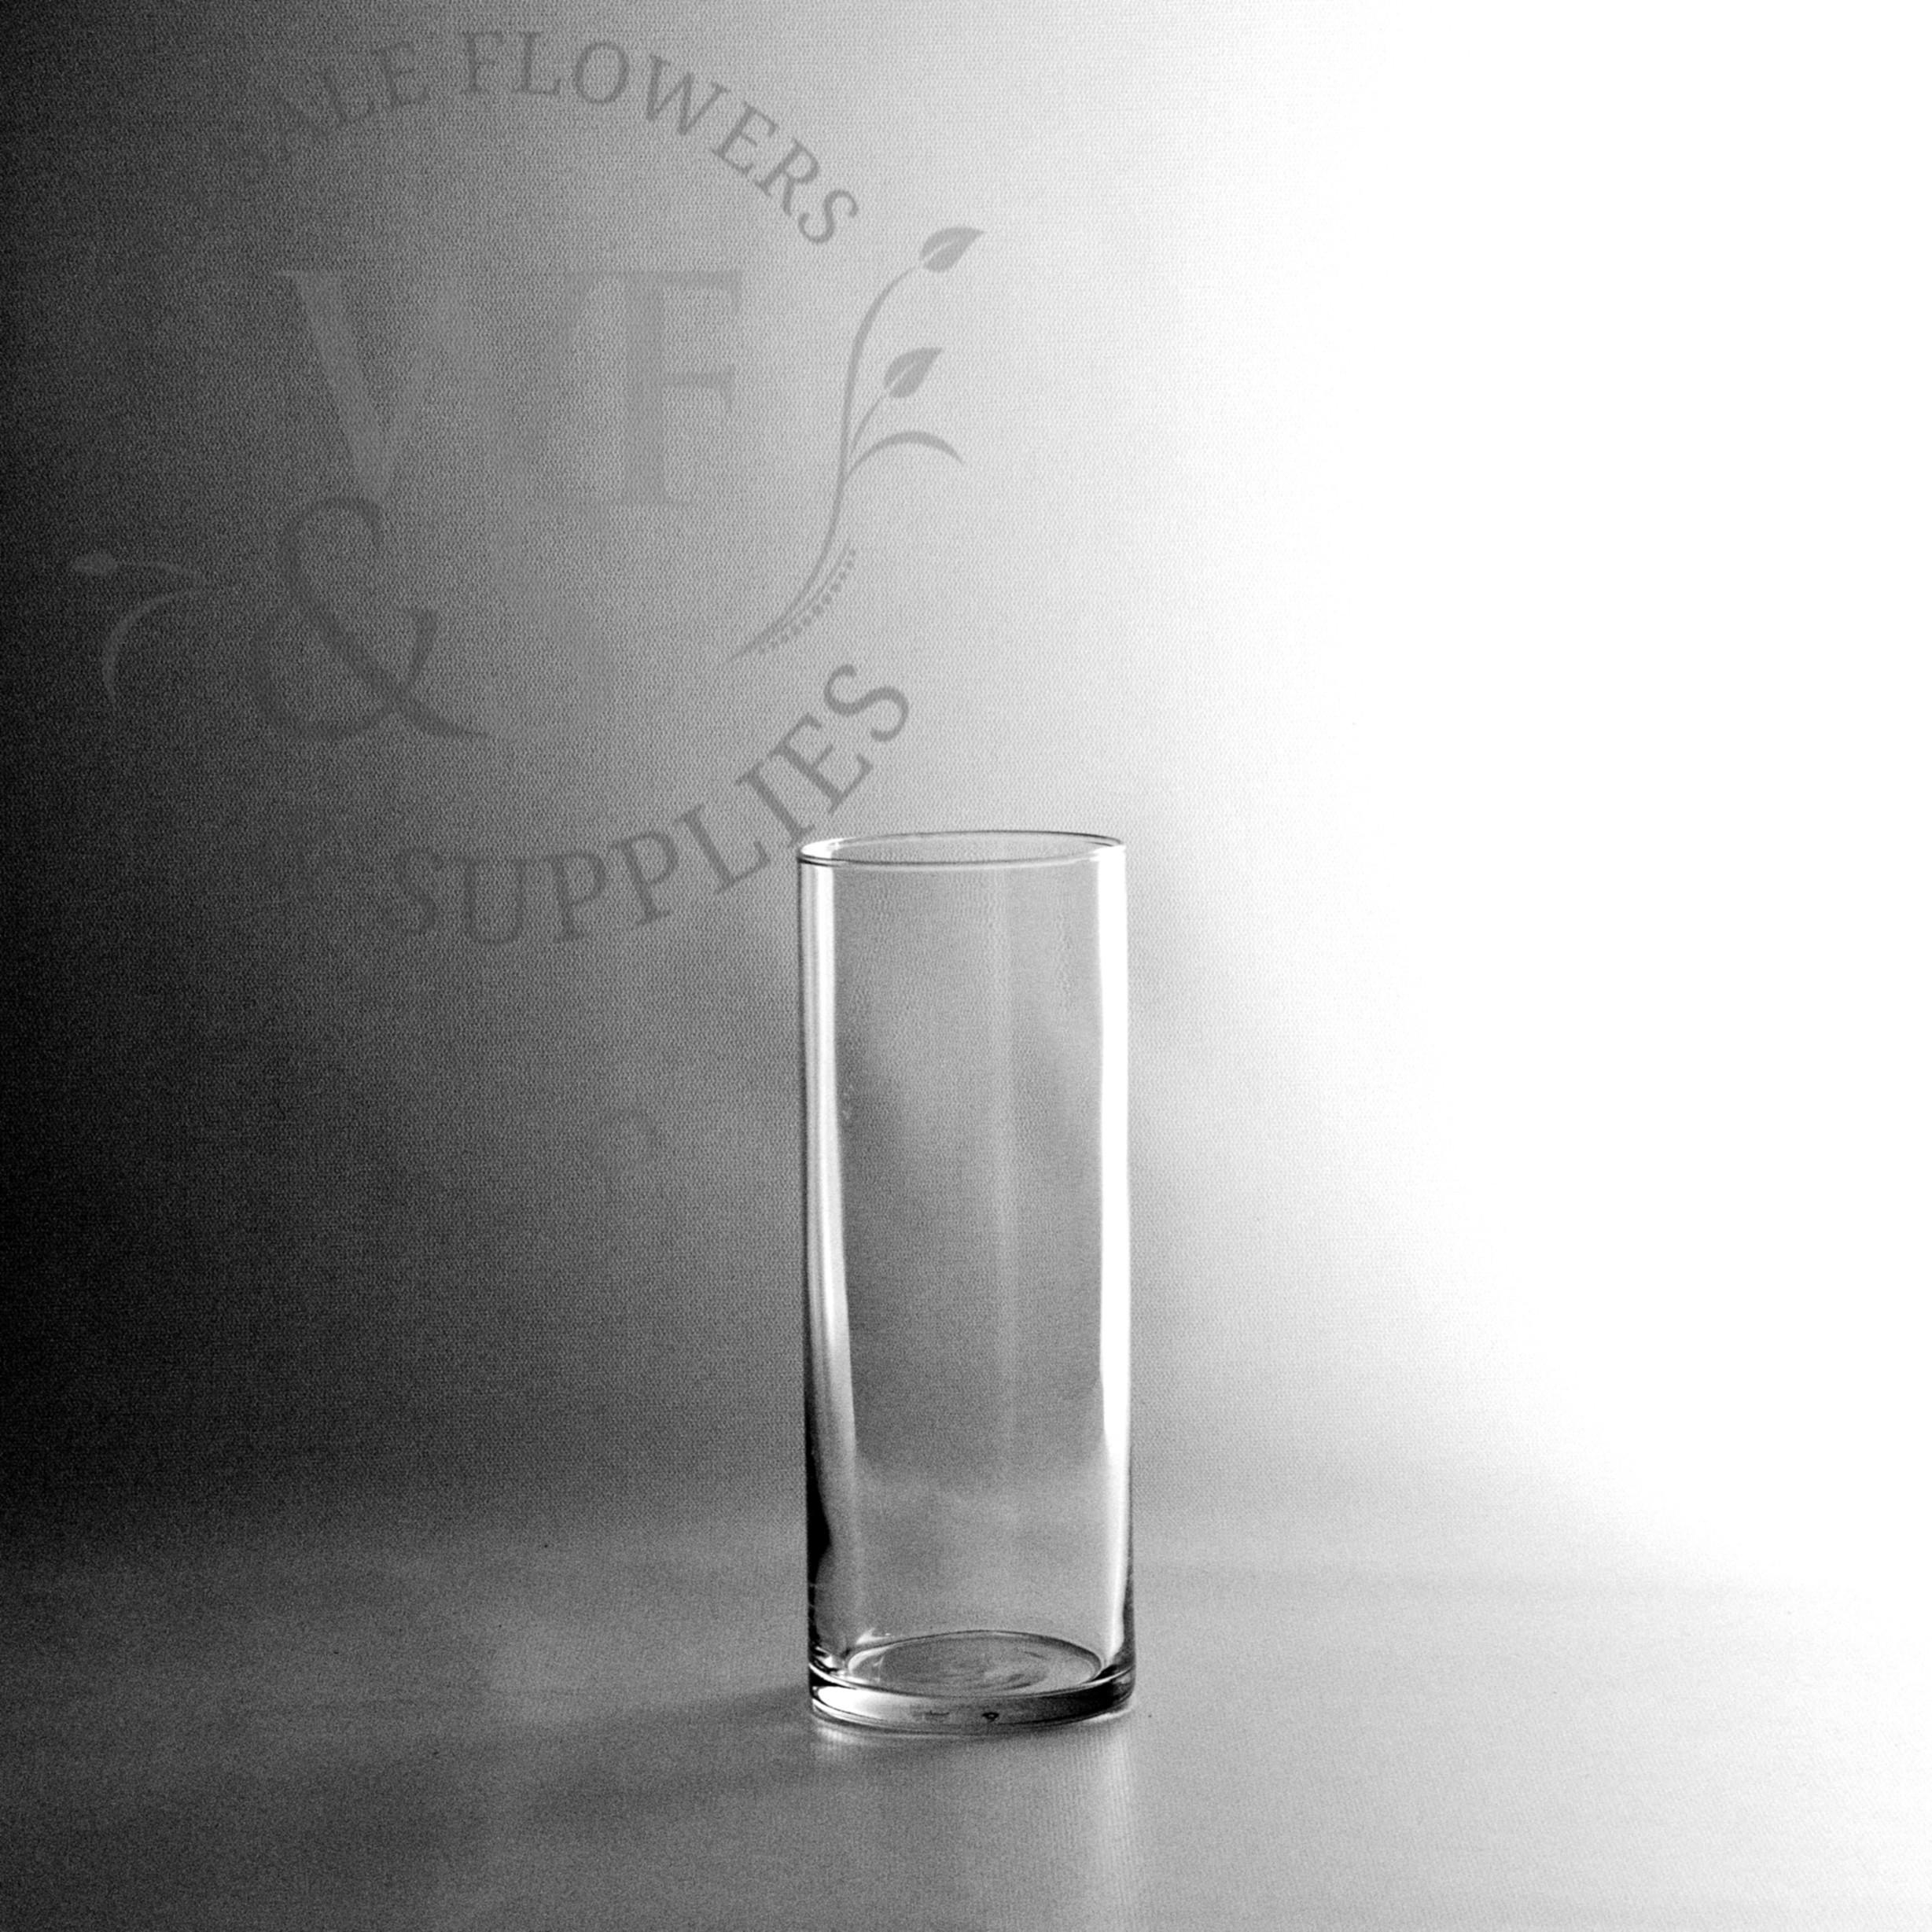 10 Stunning Bohemia Crystal Glass Vase 2021 free download bohemia crystal glass vase of why you should not go to glass vases wholesale glass vases with crystal glass vases wholesale elegant cylinder vases wholesale